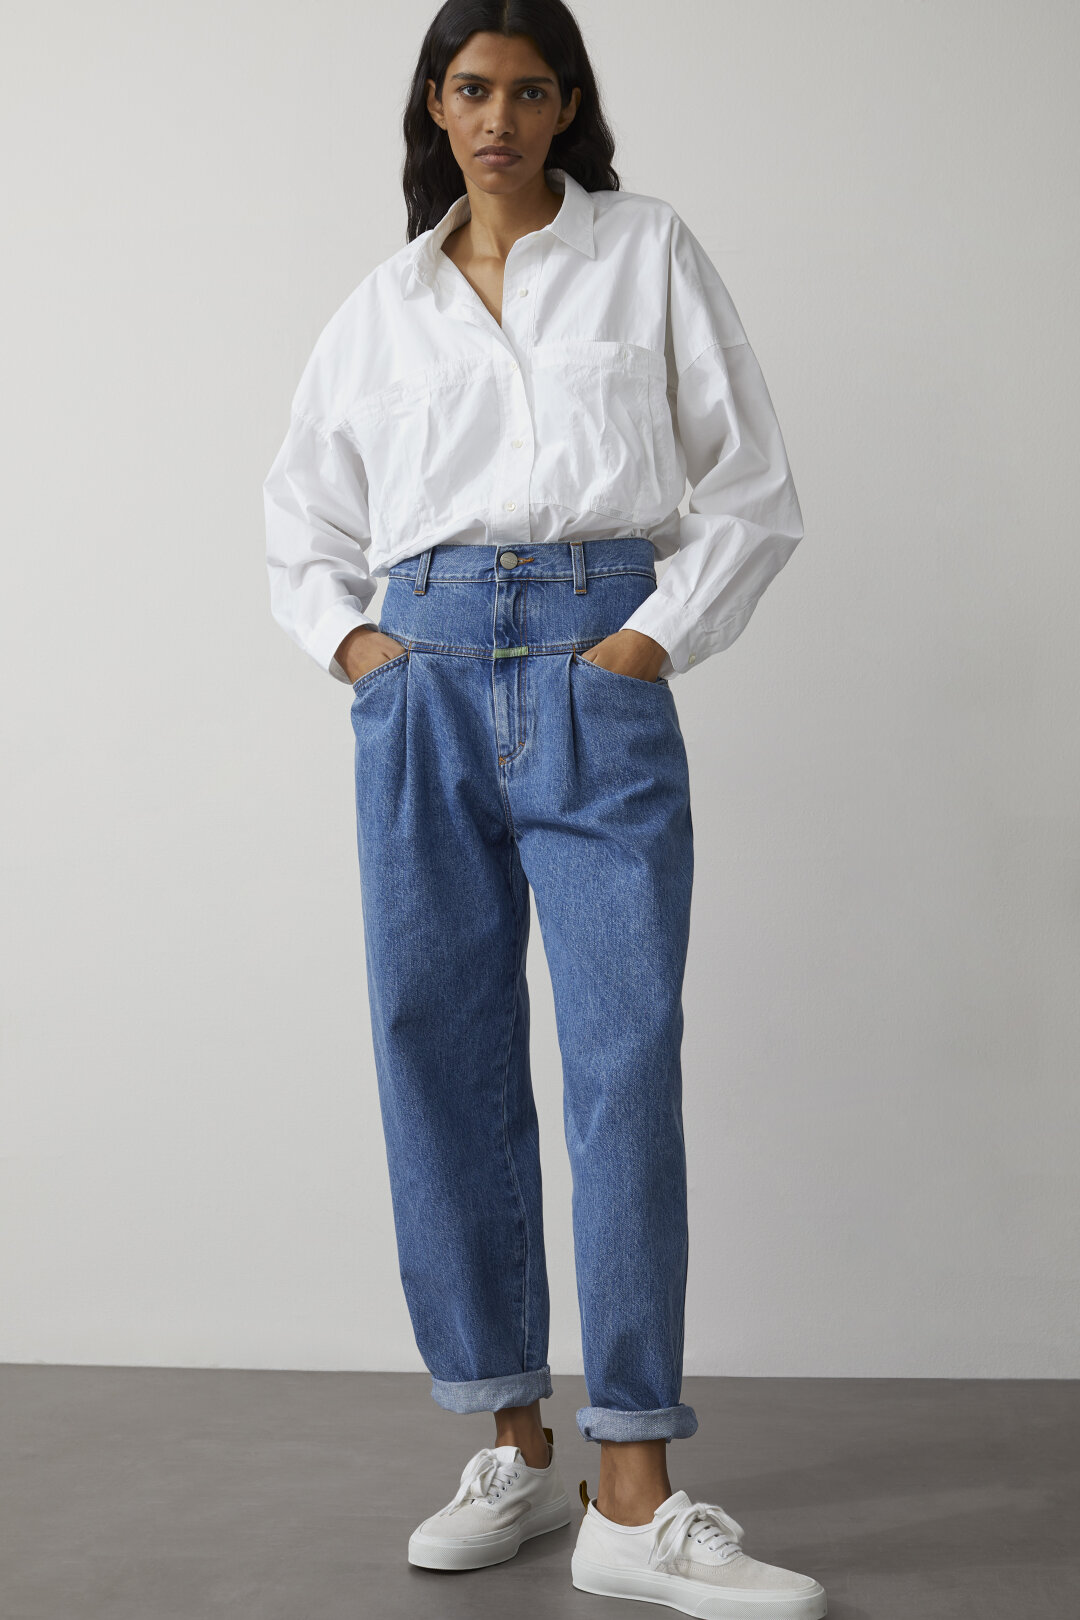 Closed Cropped jeans Damen Denim Blue Mbl Kleidung 78 jeans